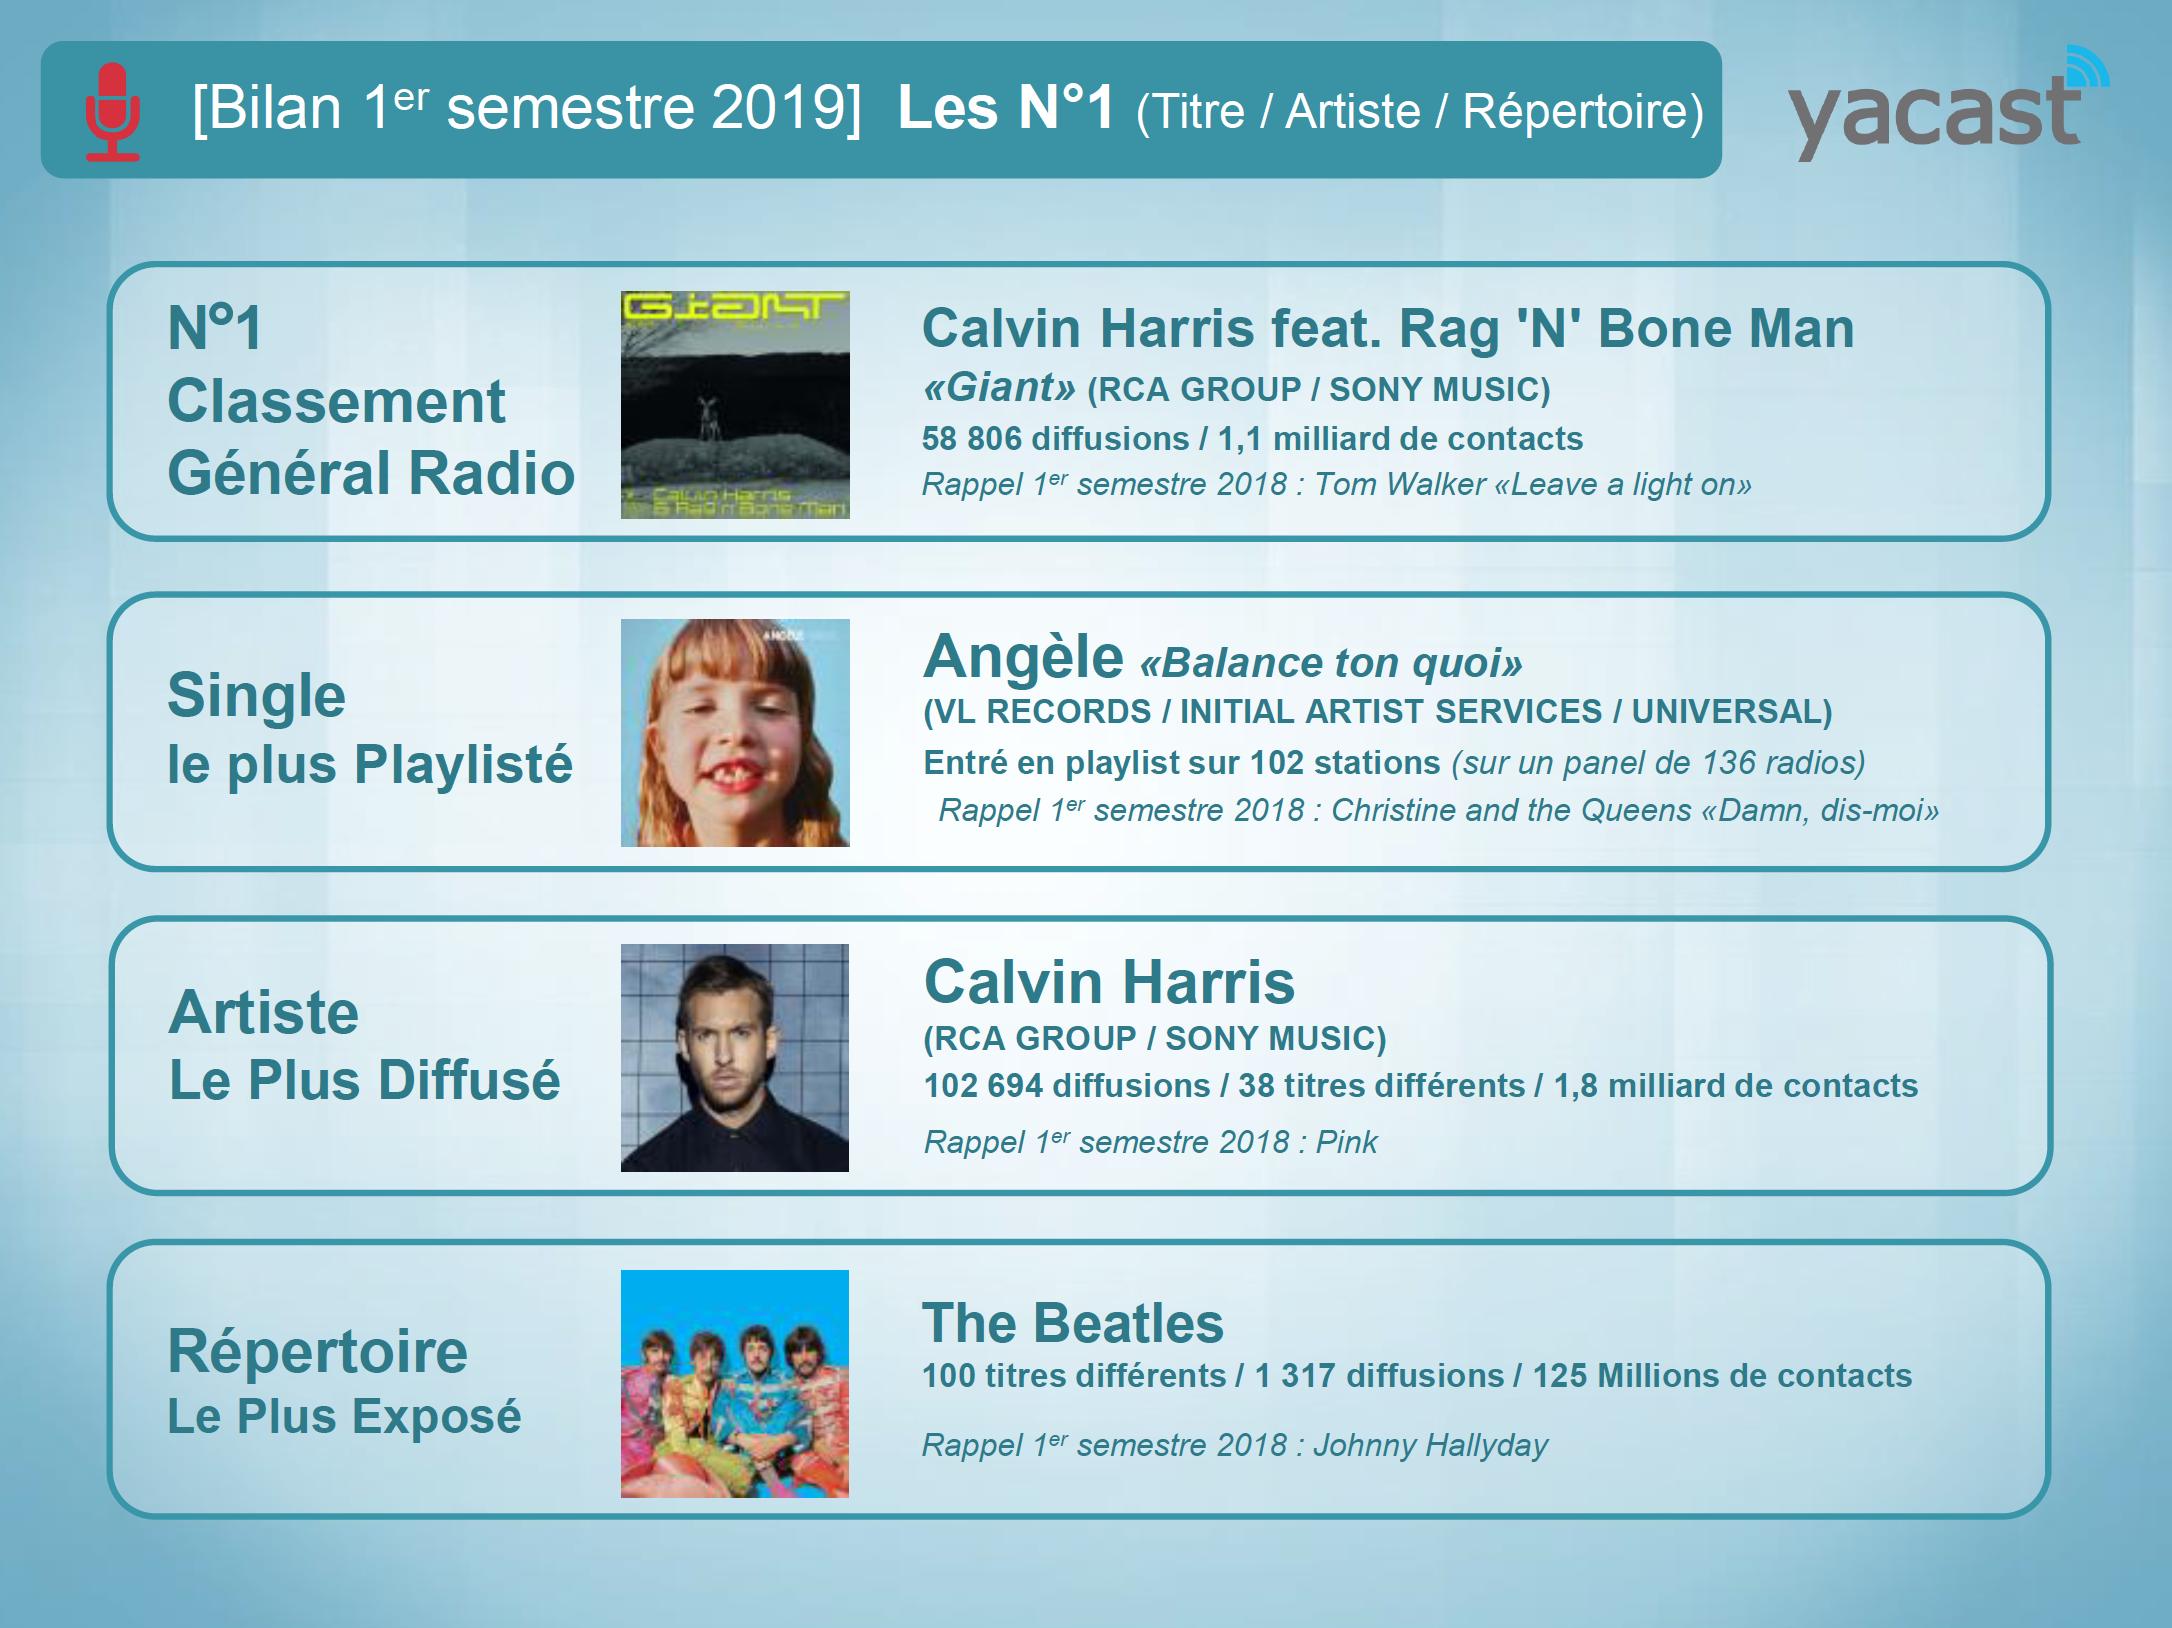 Yacast fait le bilan musical du 1er semestre 2019